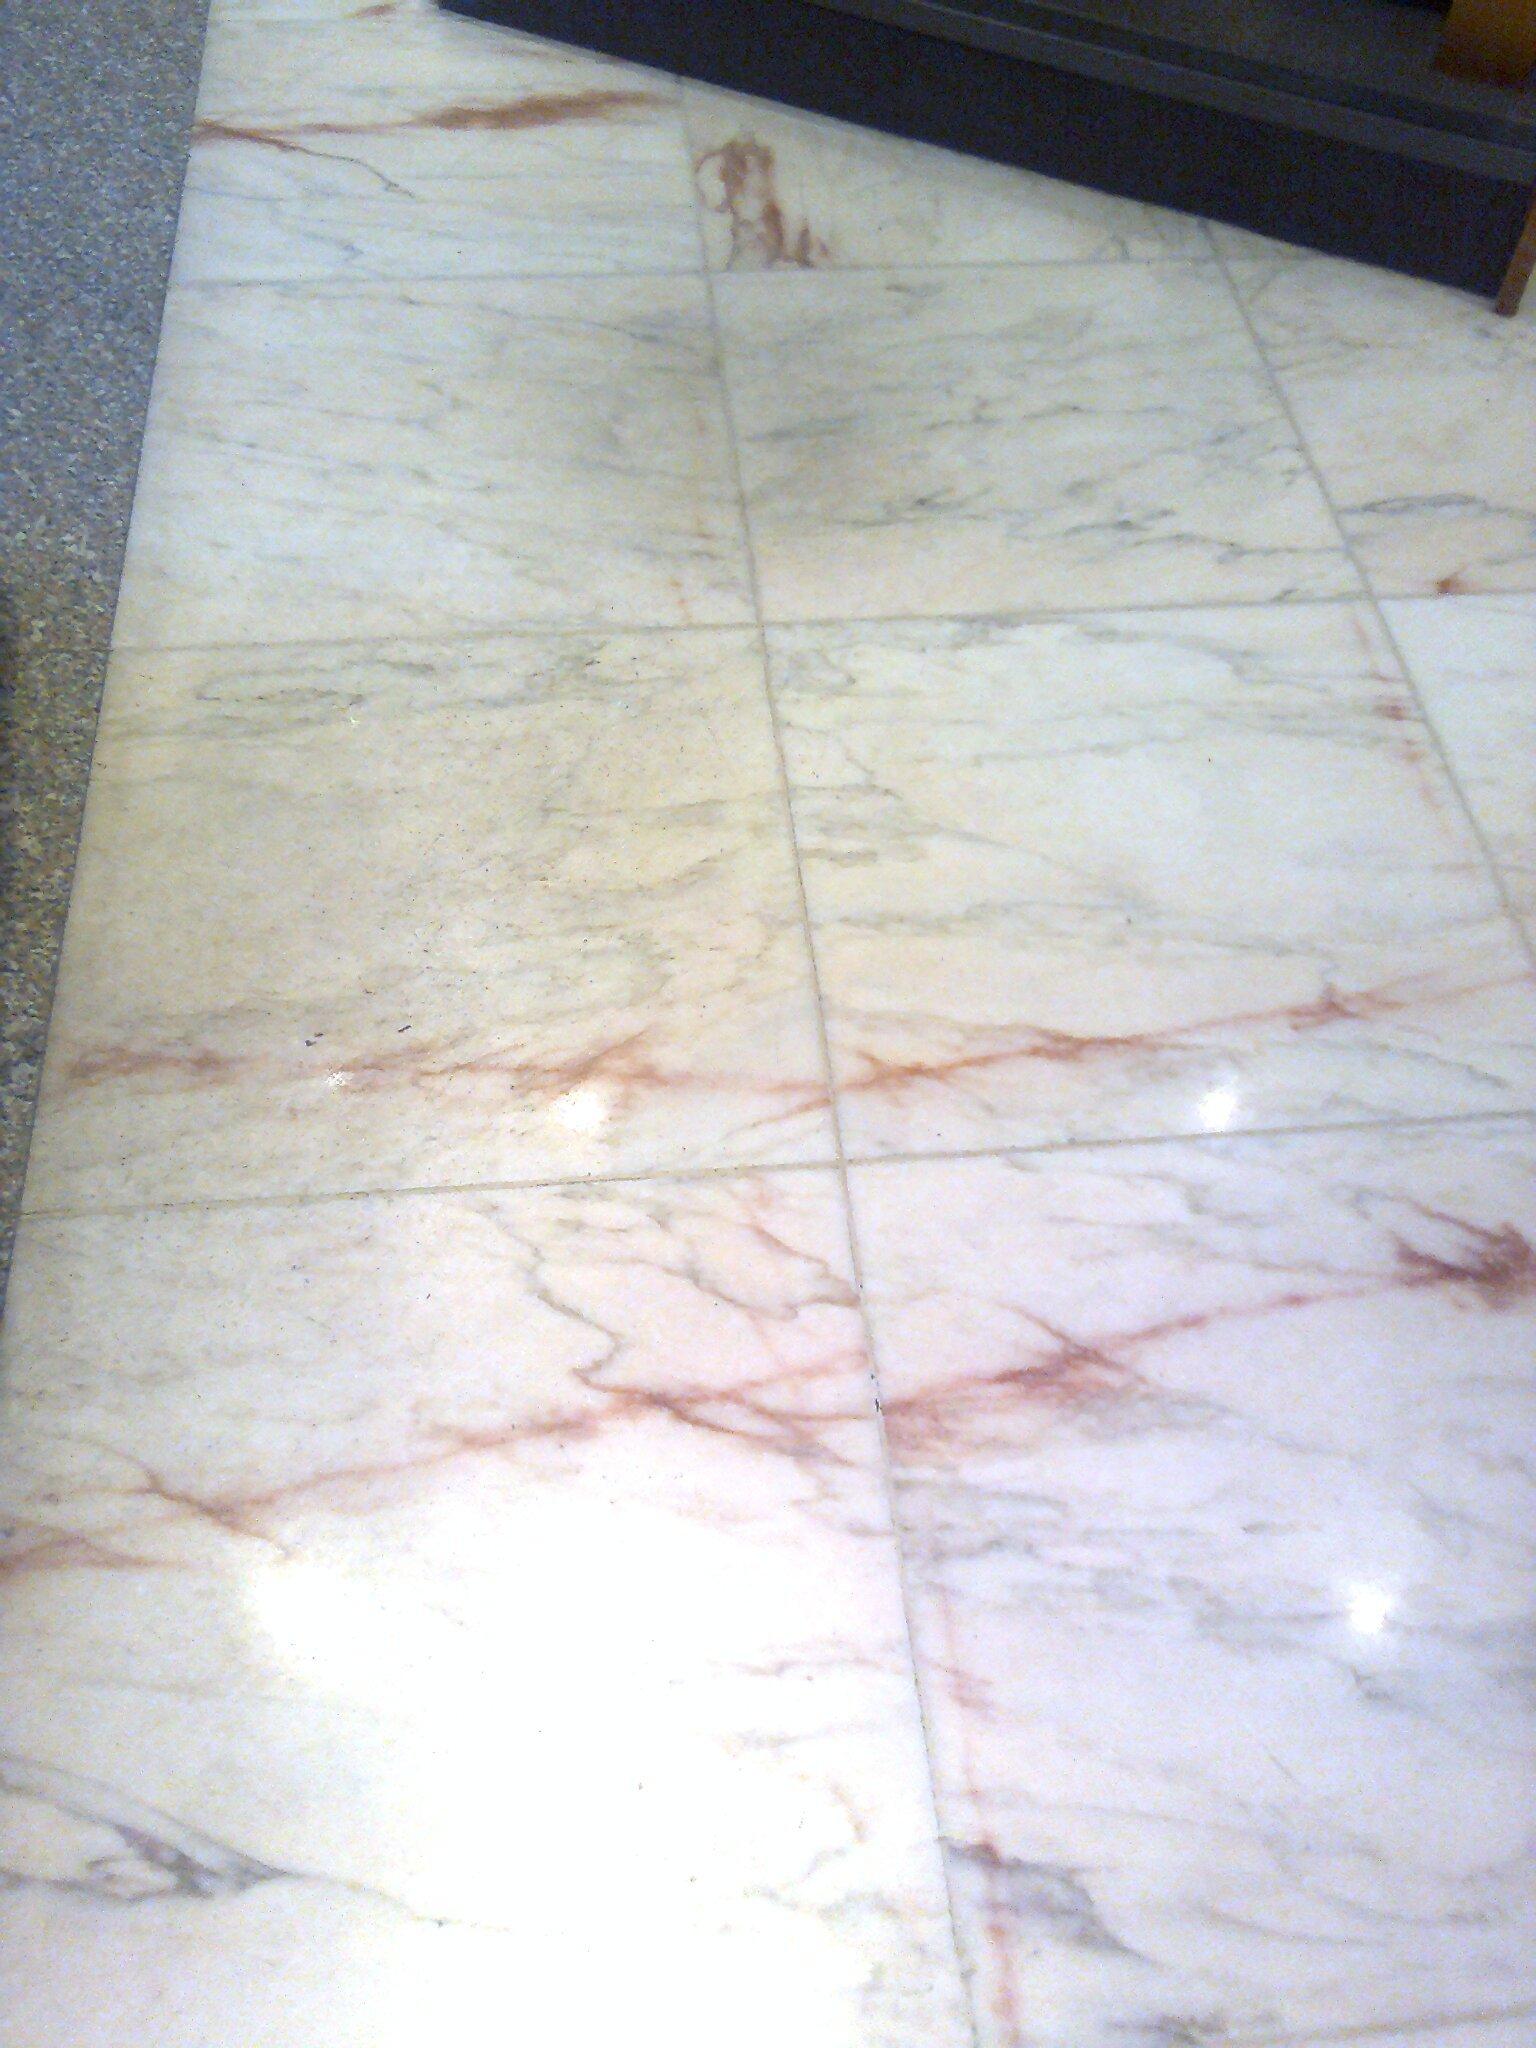 Marble Floor Cleaning Polishing Sealing Weybridge Surrey: Marble Polishing From NuLifeFloorcare.co.uk